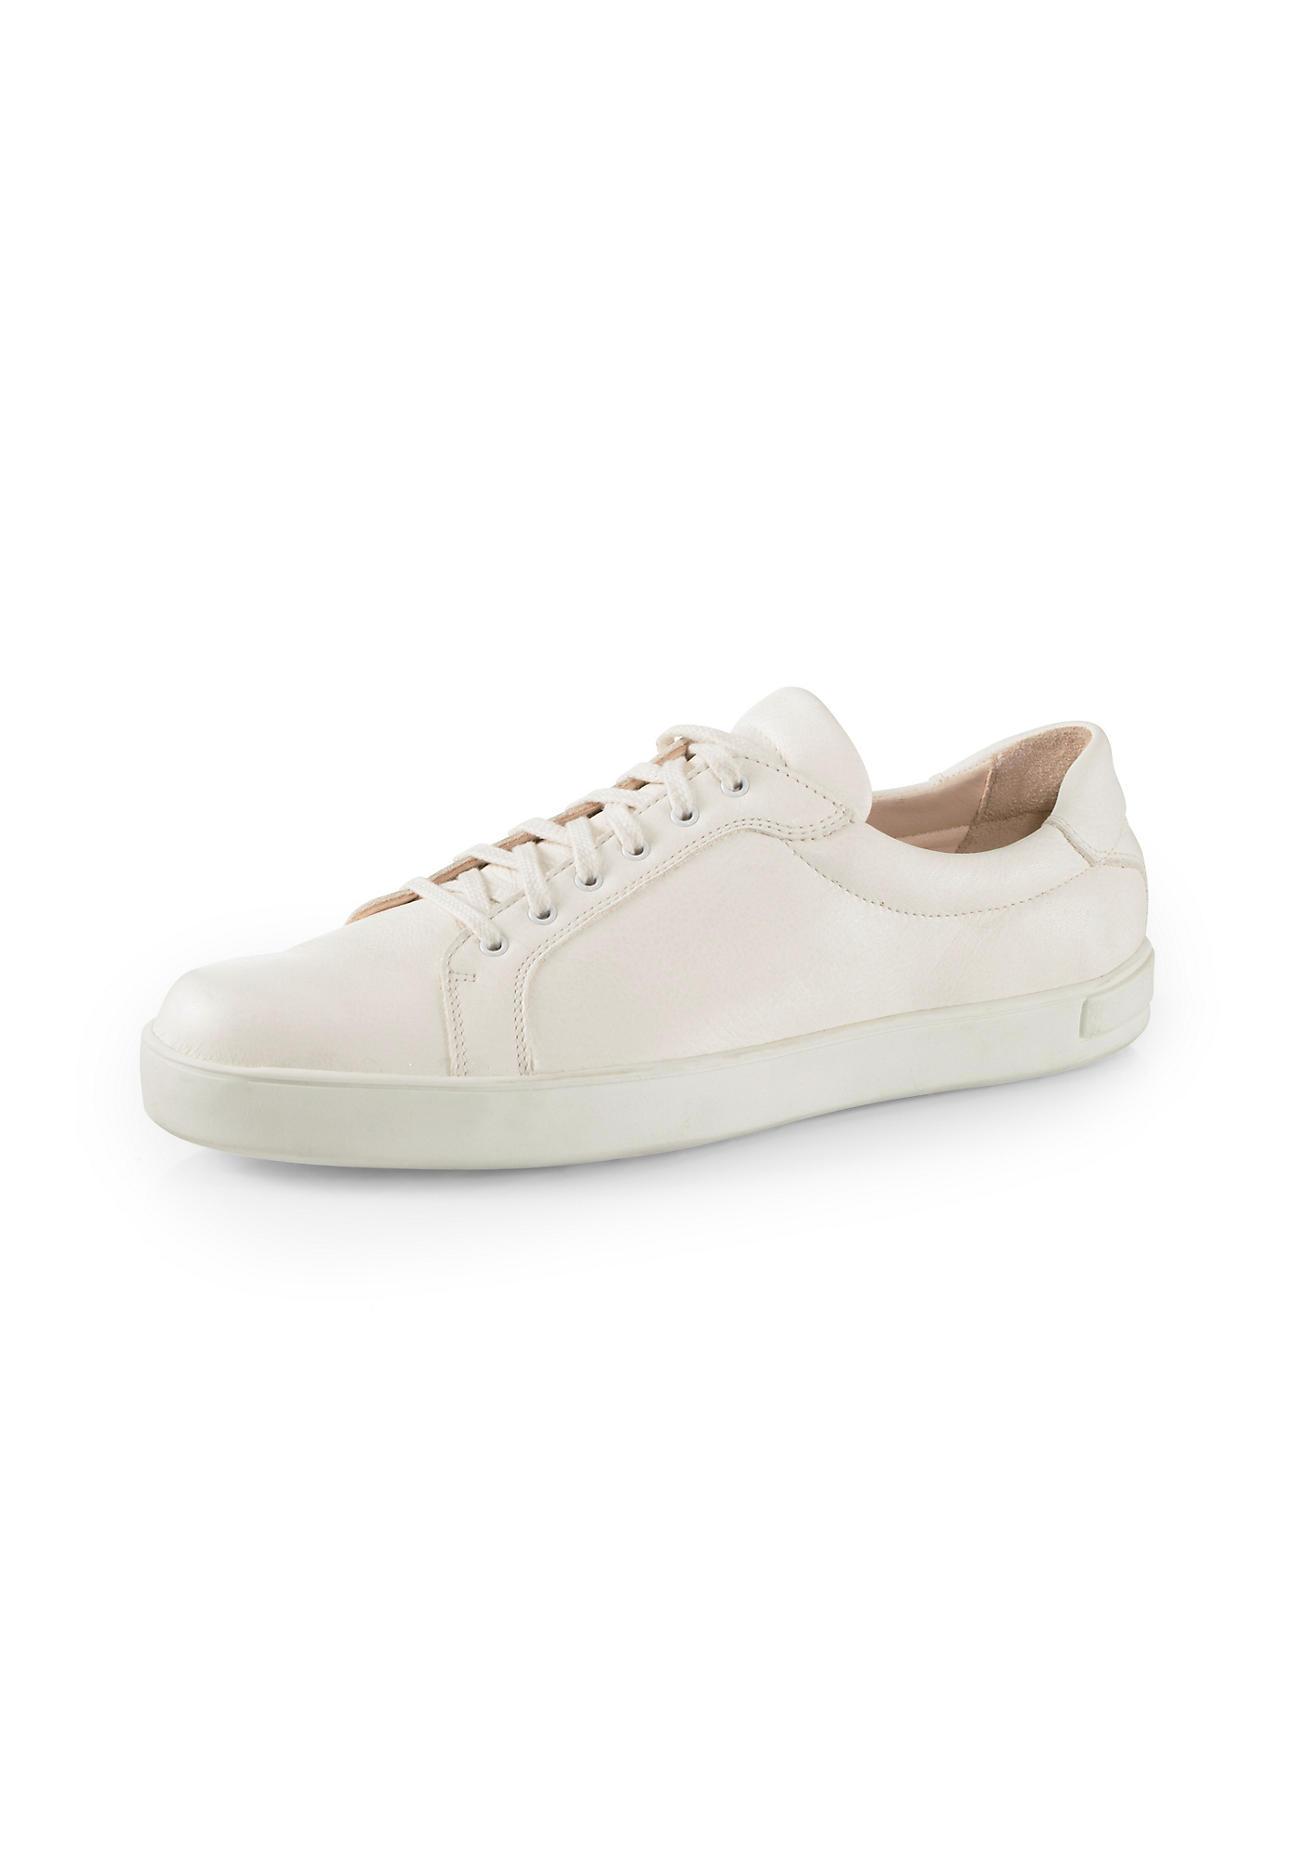 hessnatur Herren Herren Sneaker aus Leder – naturfarben – Größe 44